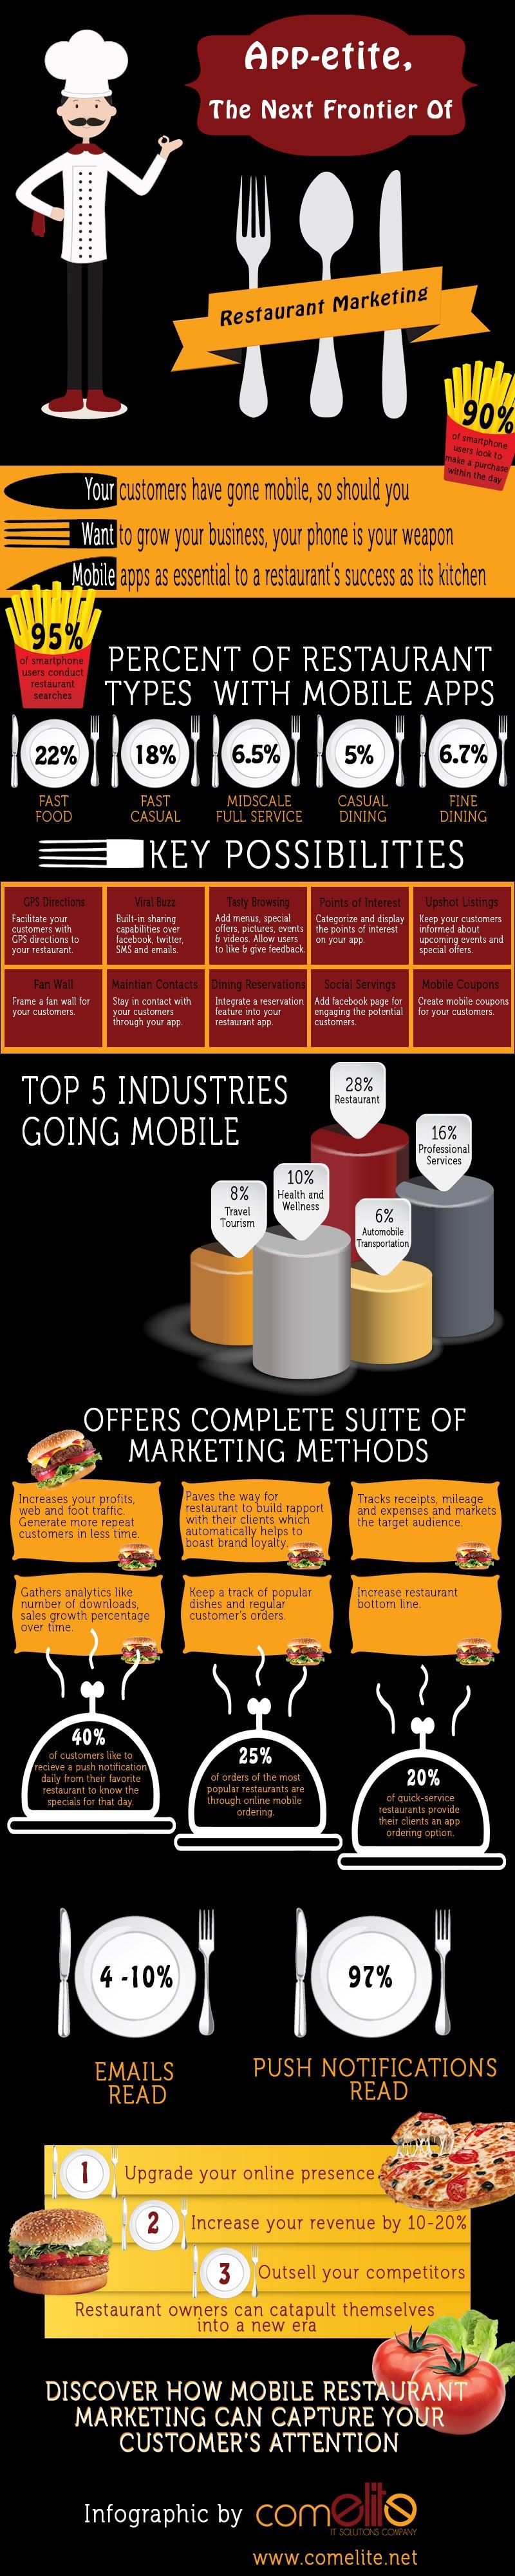 infografia-apps-ventajas-restaurantes